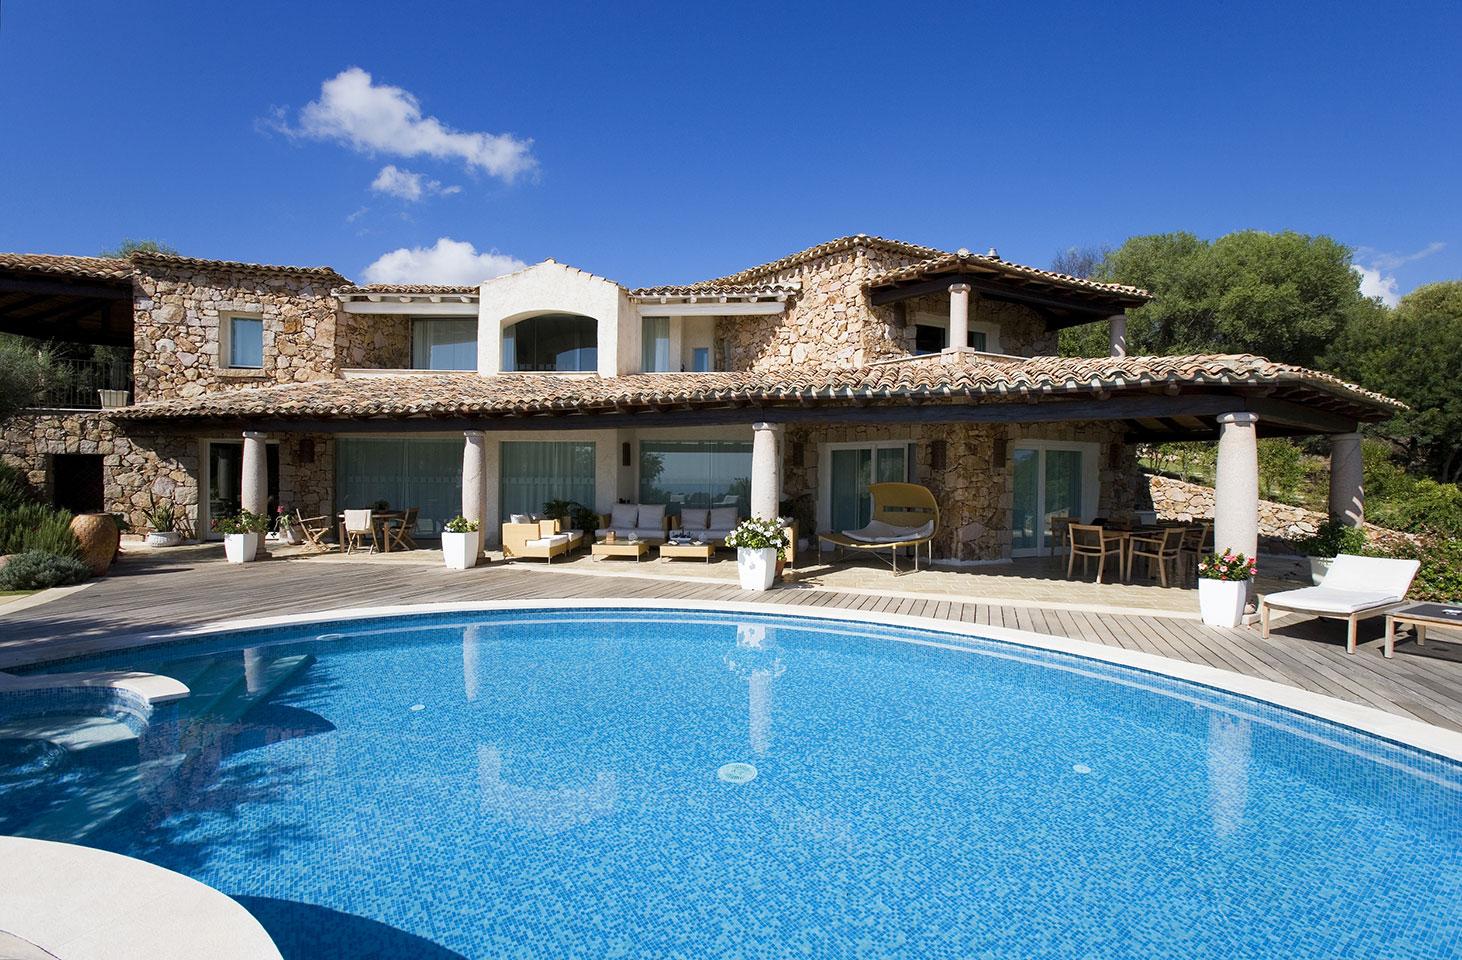 Villa sinfonia costa rei muravera sardinien italien - Villa con piscina sardegna ...